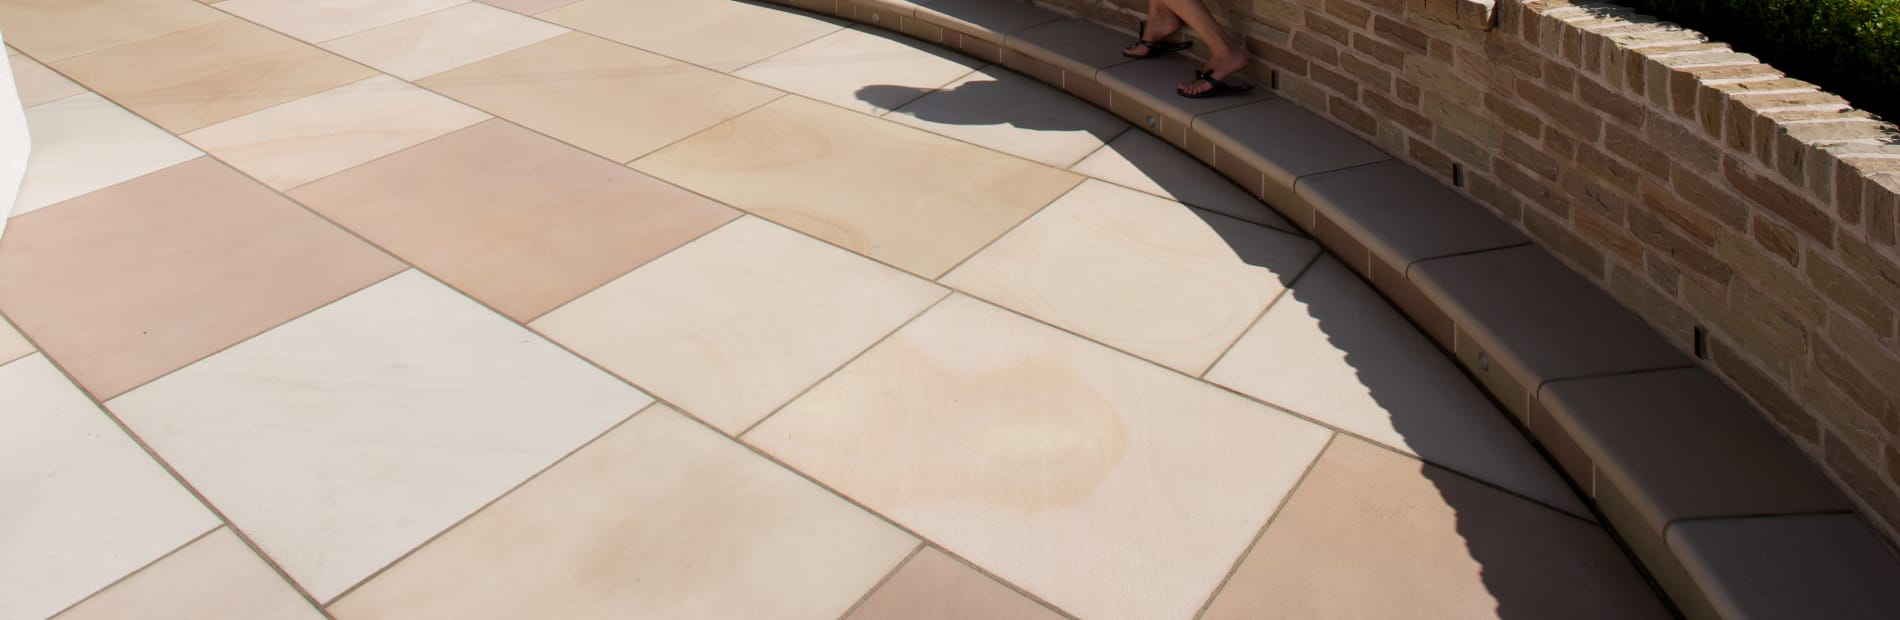 Marshalls Sandstone paving